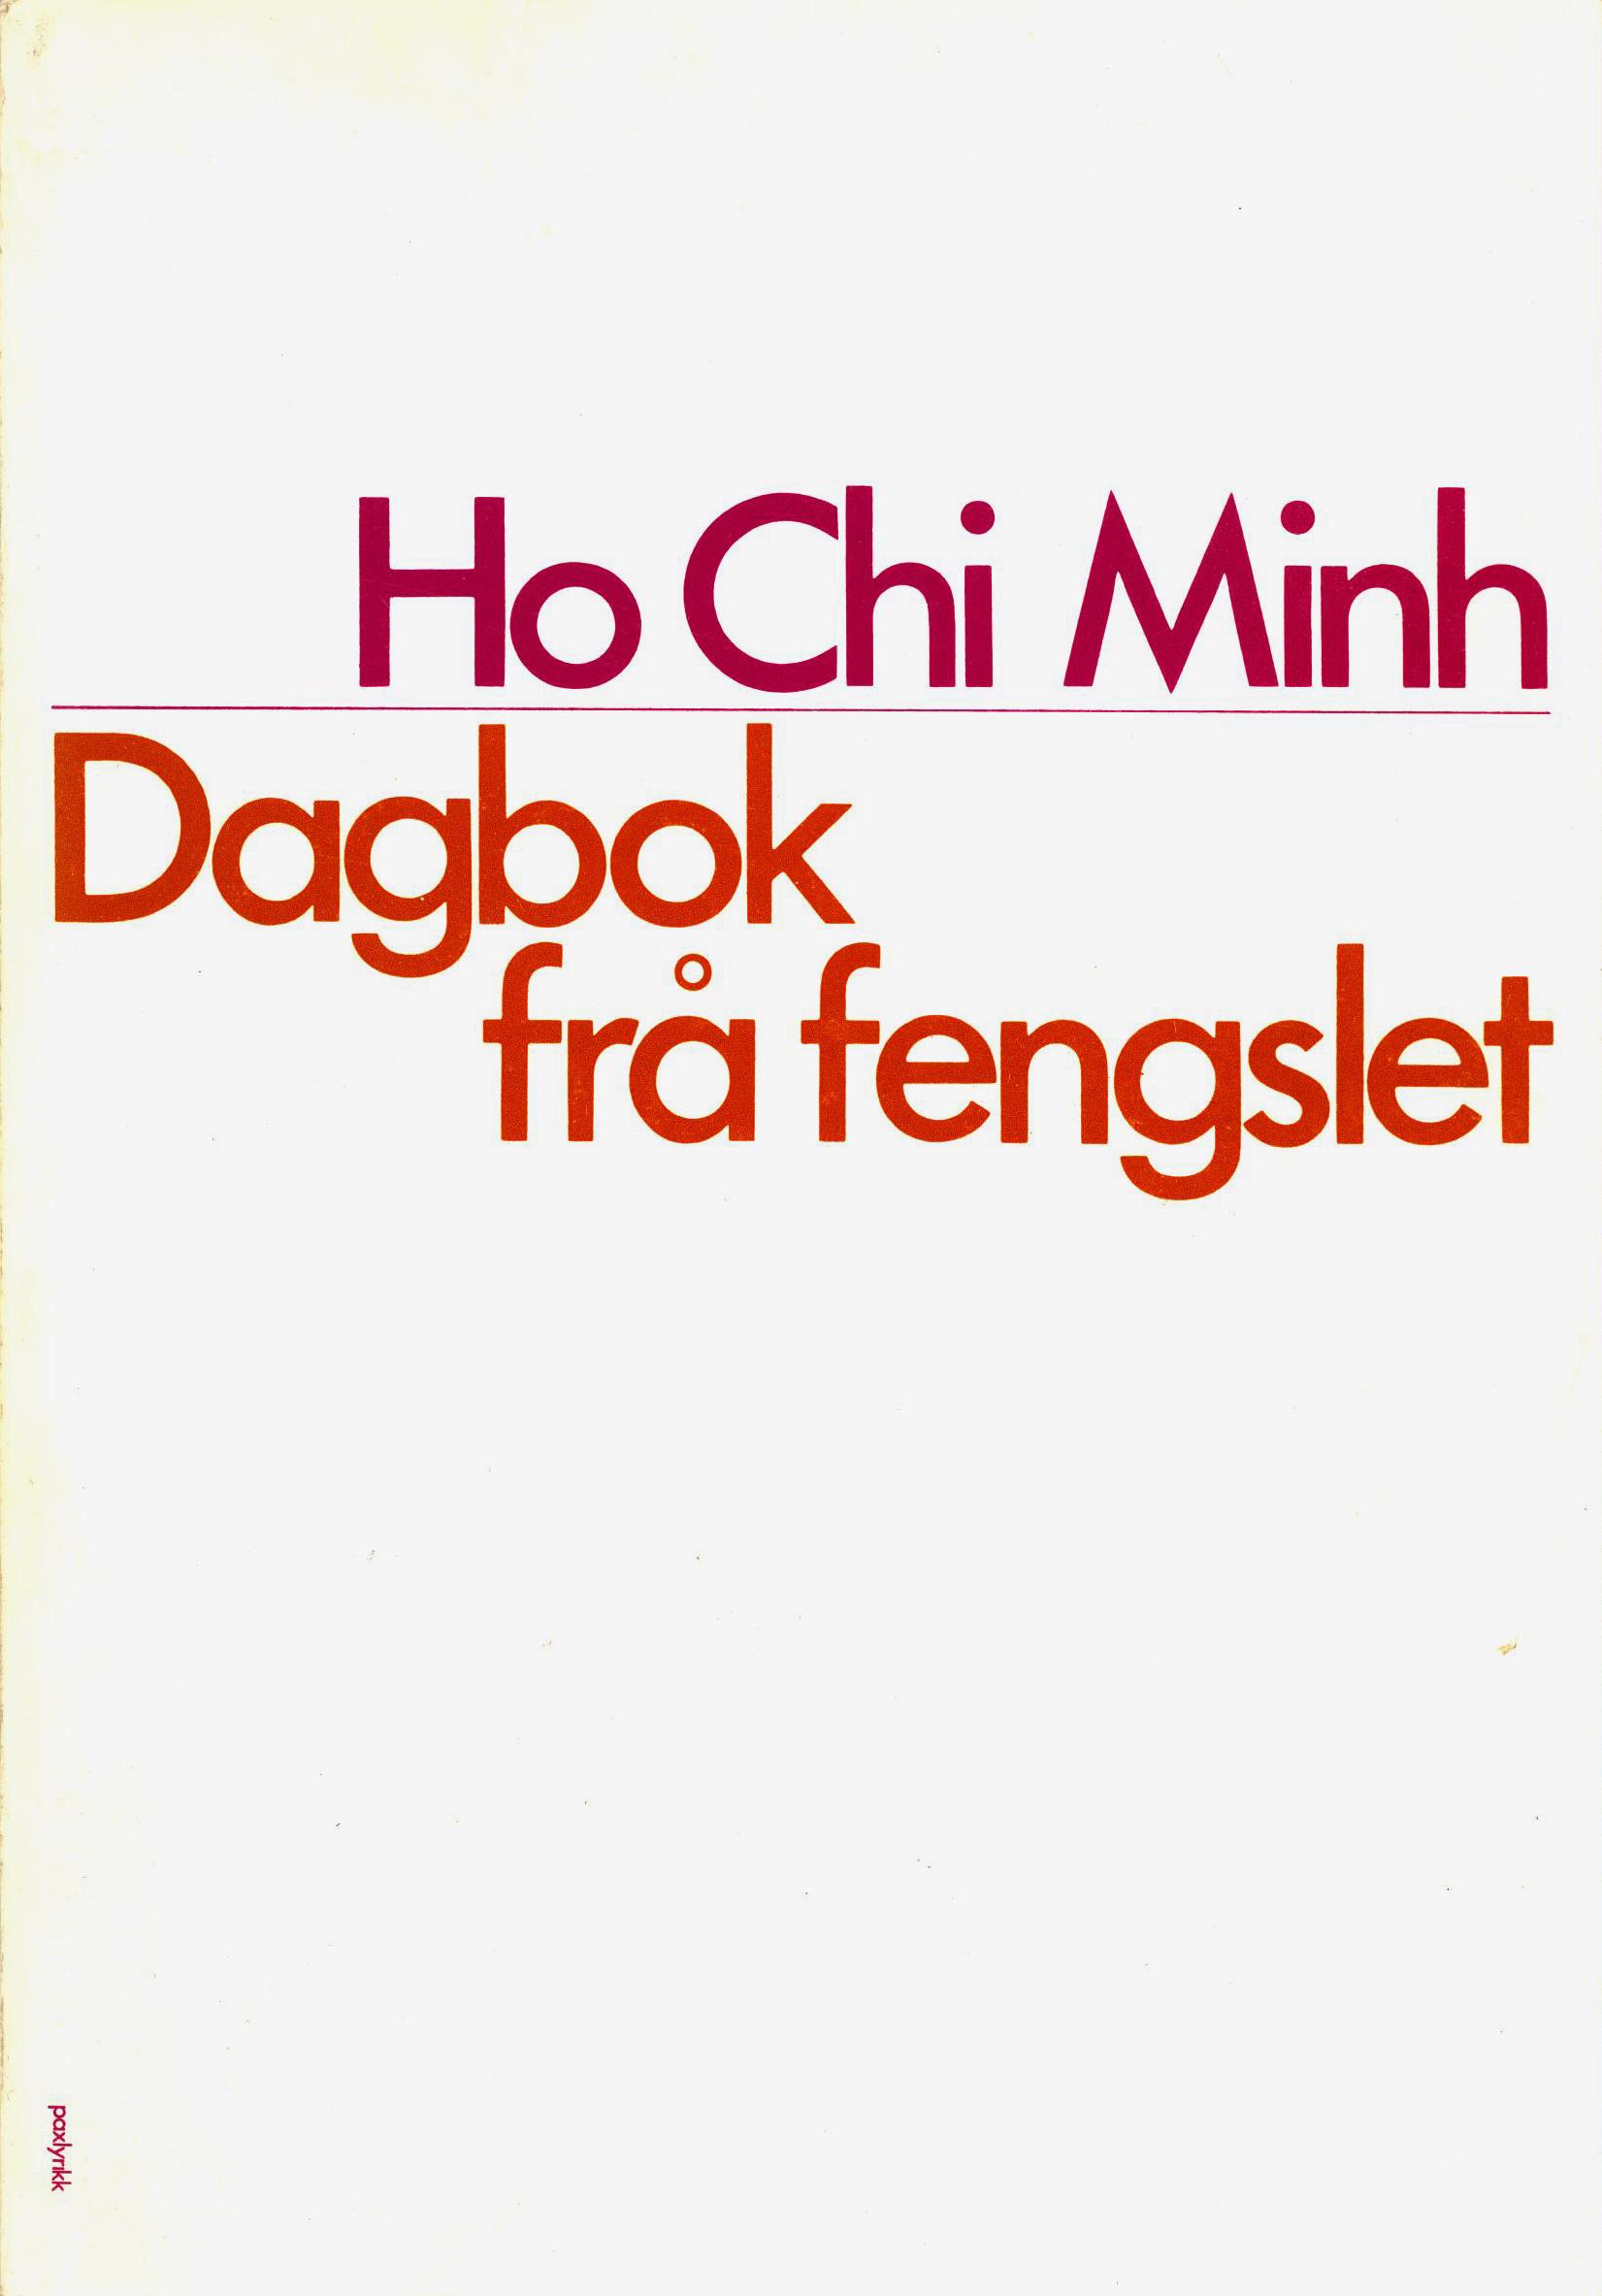 Ho Chi Minh: Dagbok frå fengslet